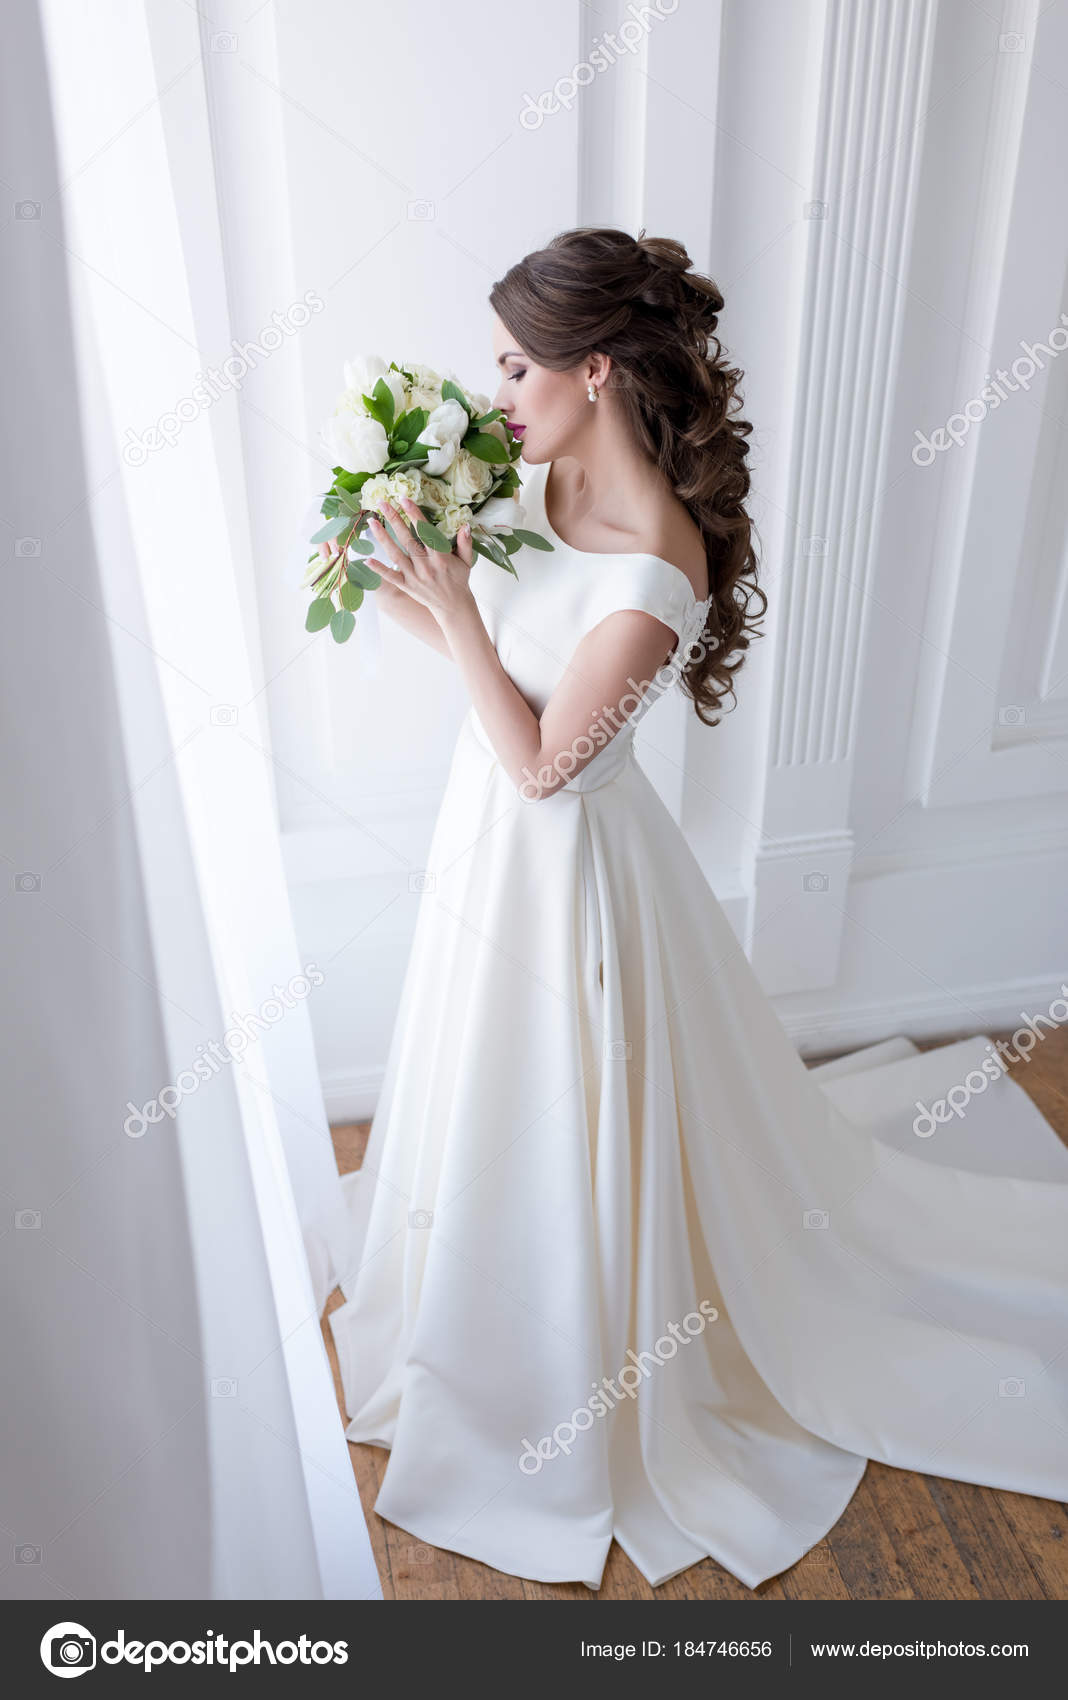 Witte Jurk Op Een Bruiloft.Elegante Bruid Traditionele Witte Jurk Snuiven Bruiloft Boeket